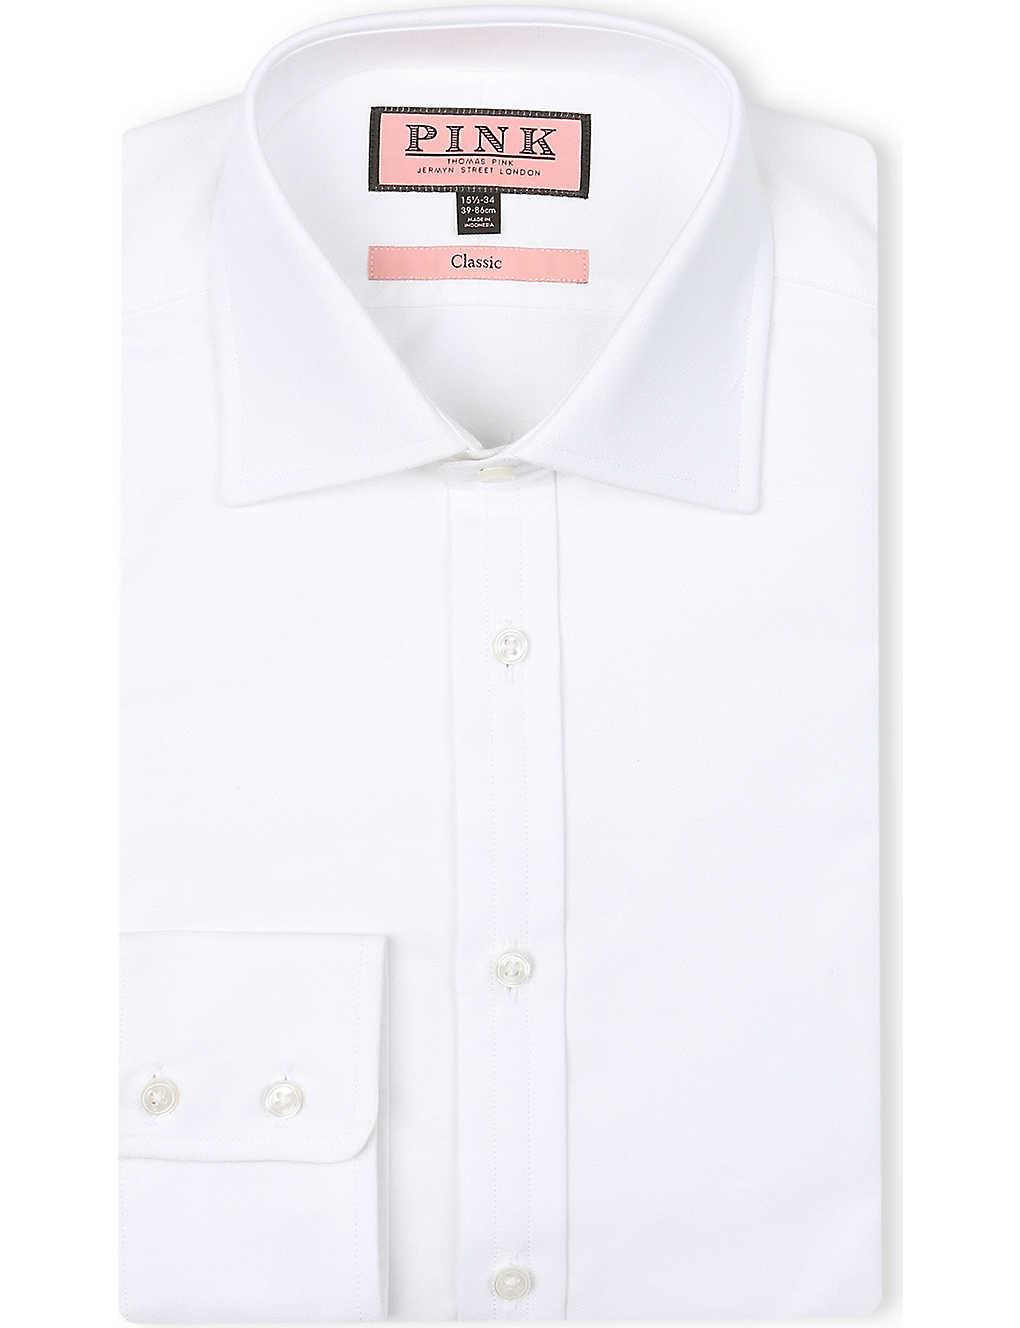 Thomas Pink Royal Oxford Classic Fit Single Cuff Shirt